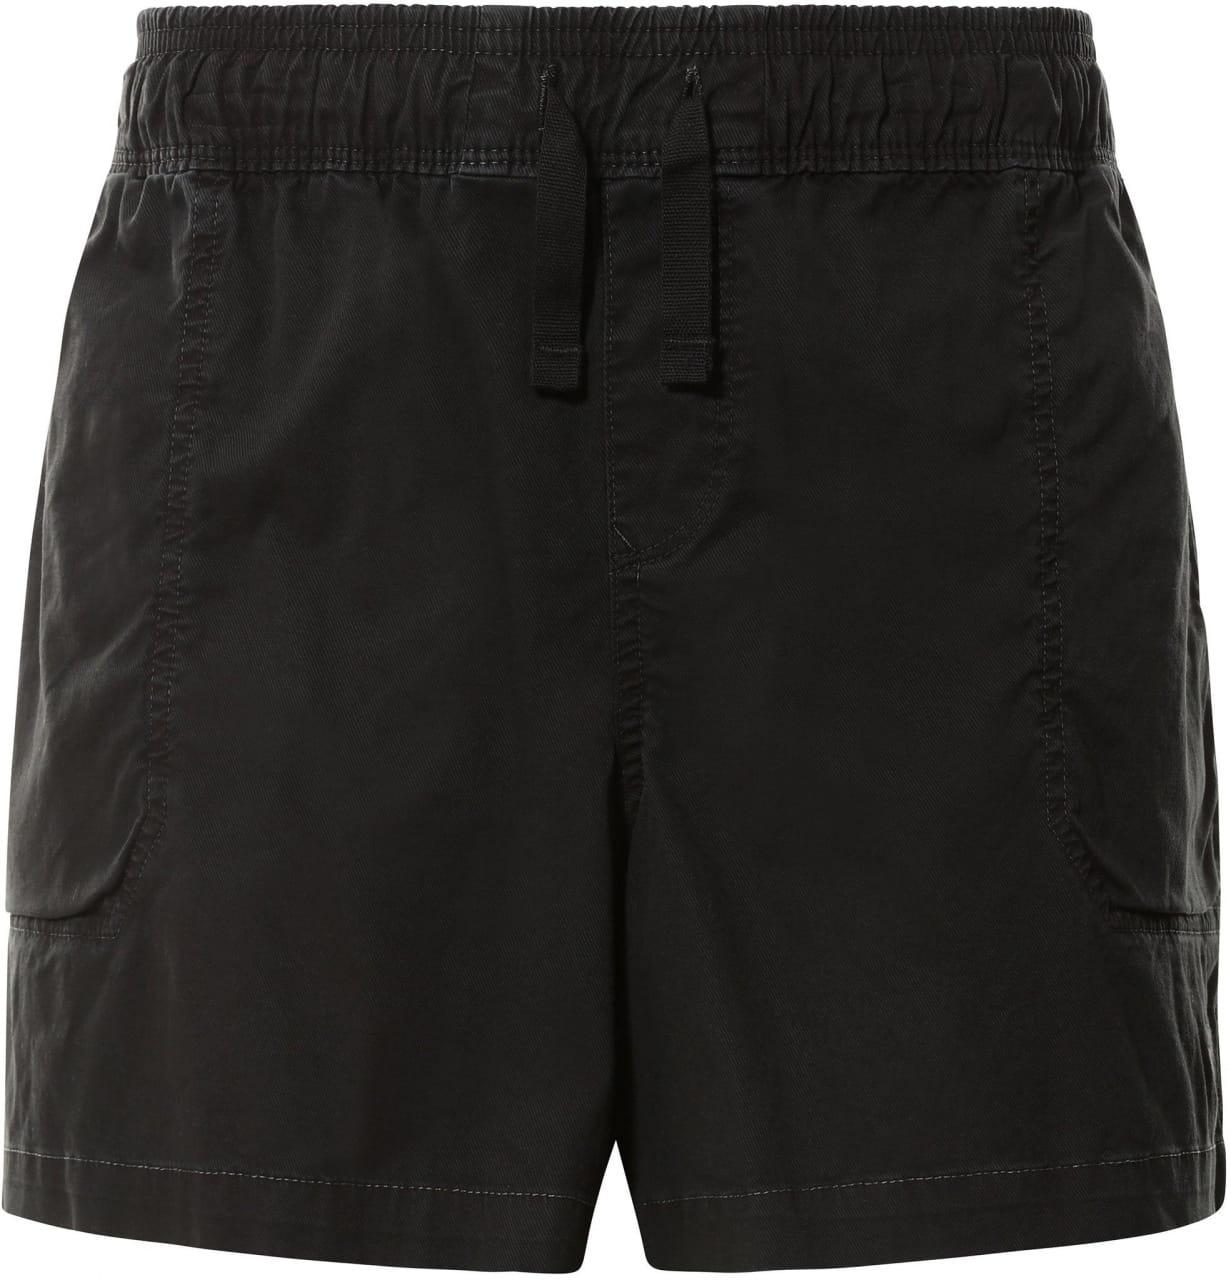 Dámské šortky The North Face Women's Motn Pull On Short